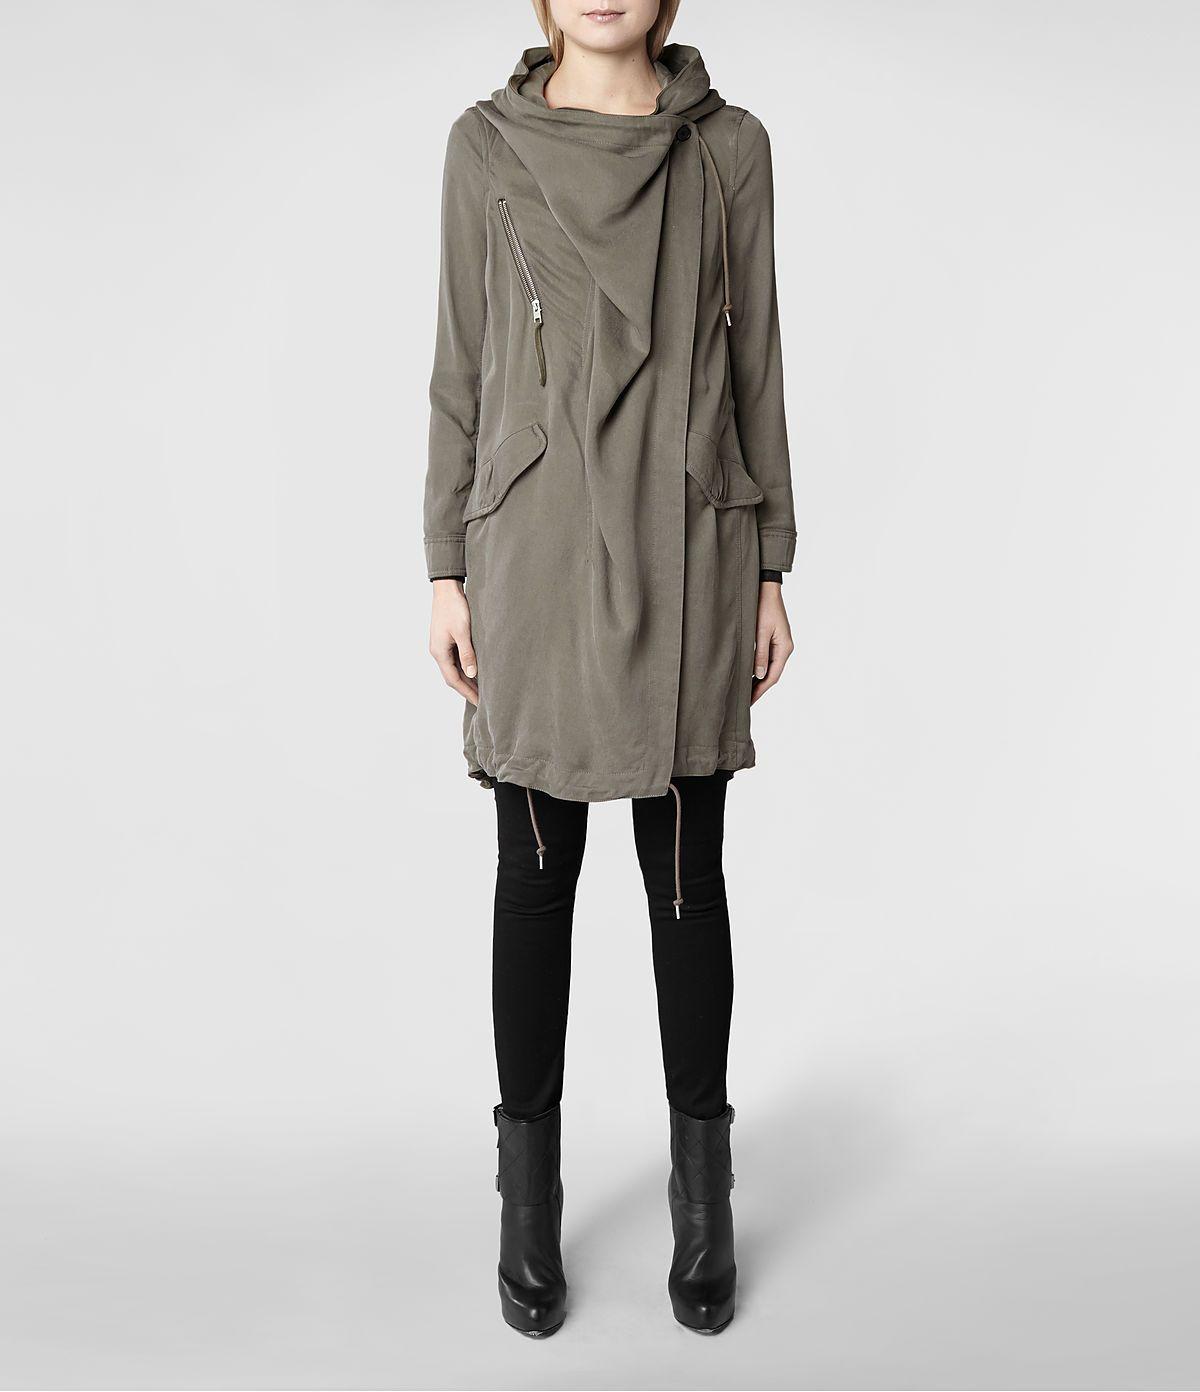 46c04882e AllSaints Portere Parka | Womens Trench Coats | I ♥ ALL SAINTS ...